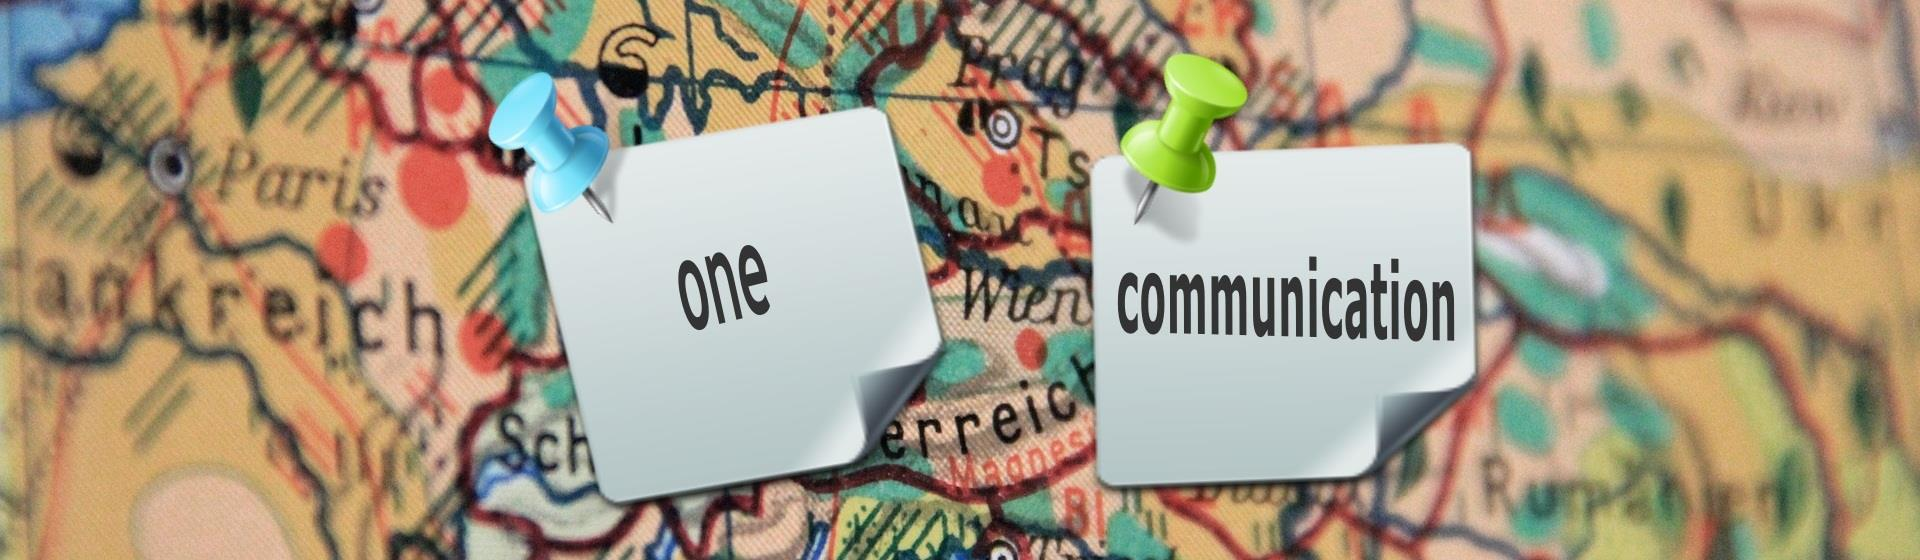 one_communication_pic1